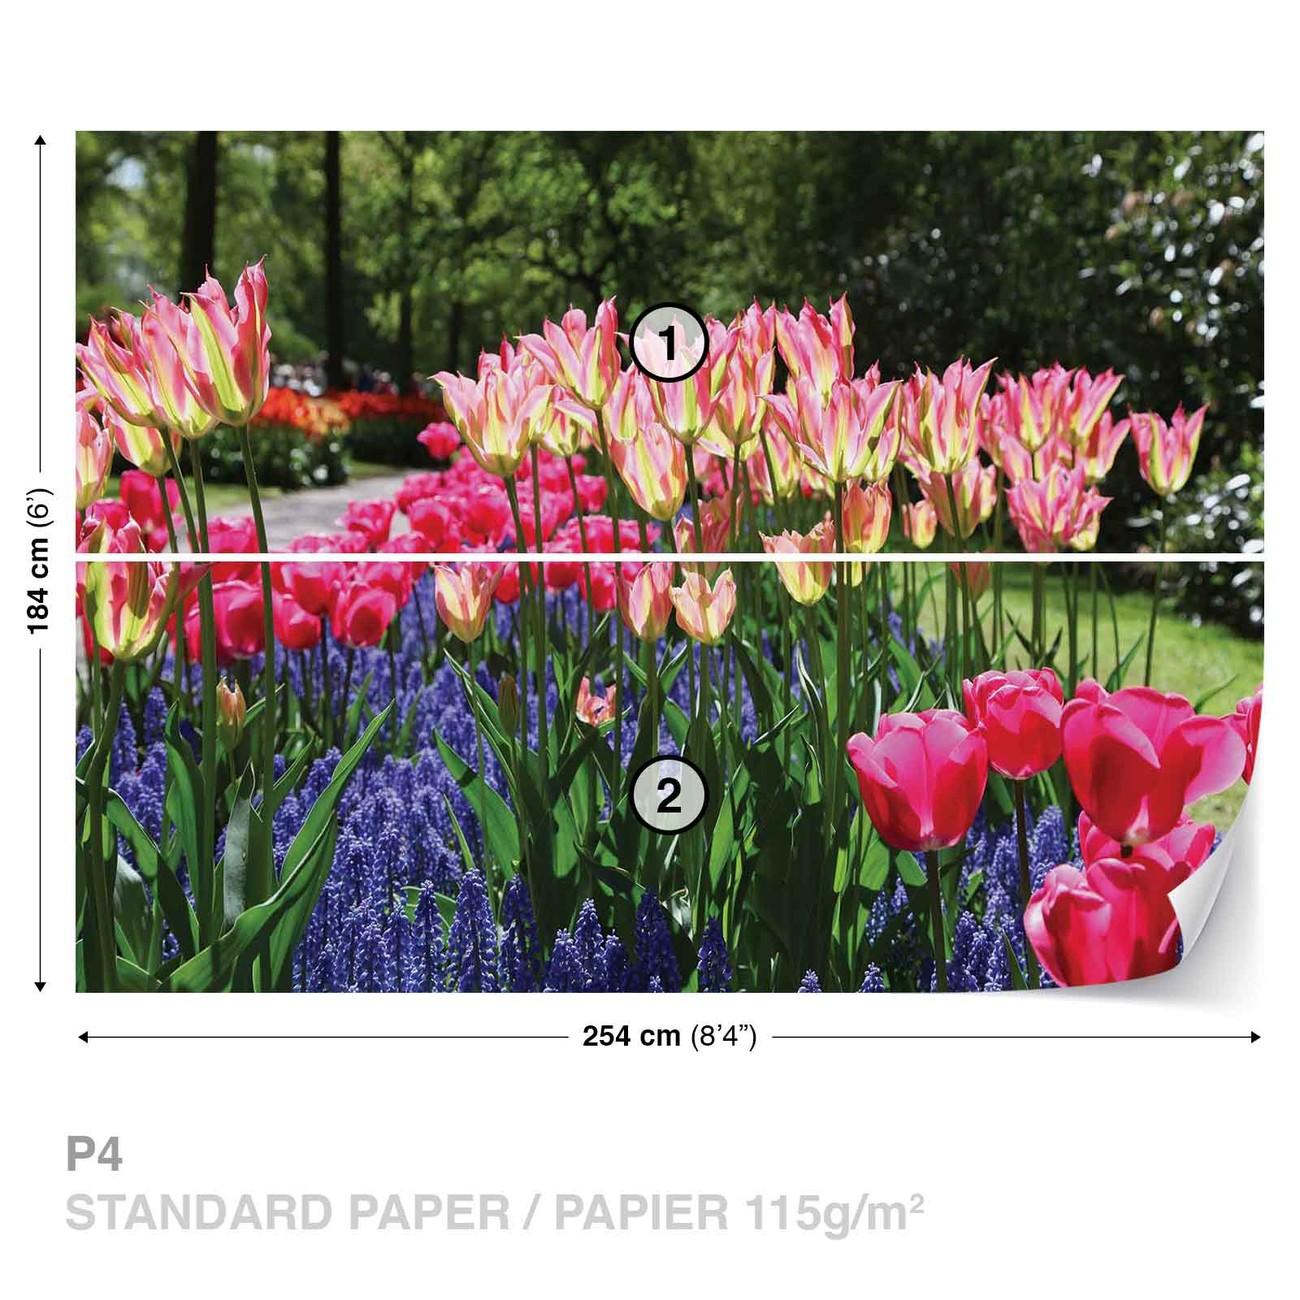 Champ de fleurs poster mural papier peint acheter le sur - Ou acheter le tapis champ de fleurs ...